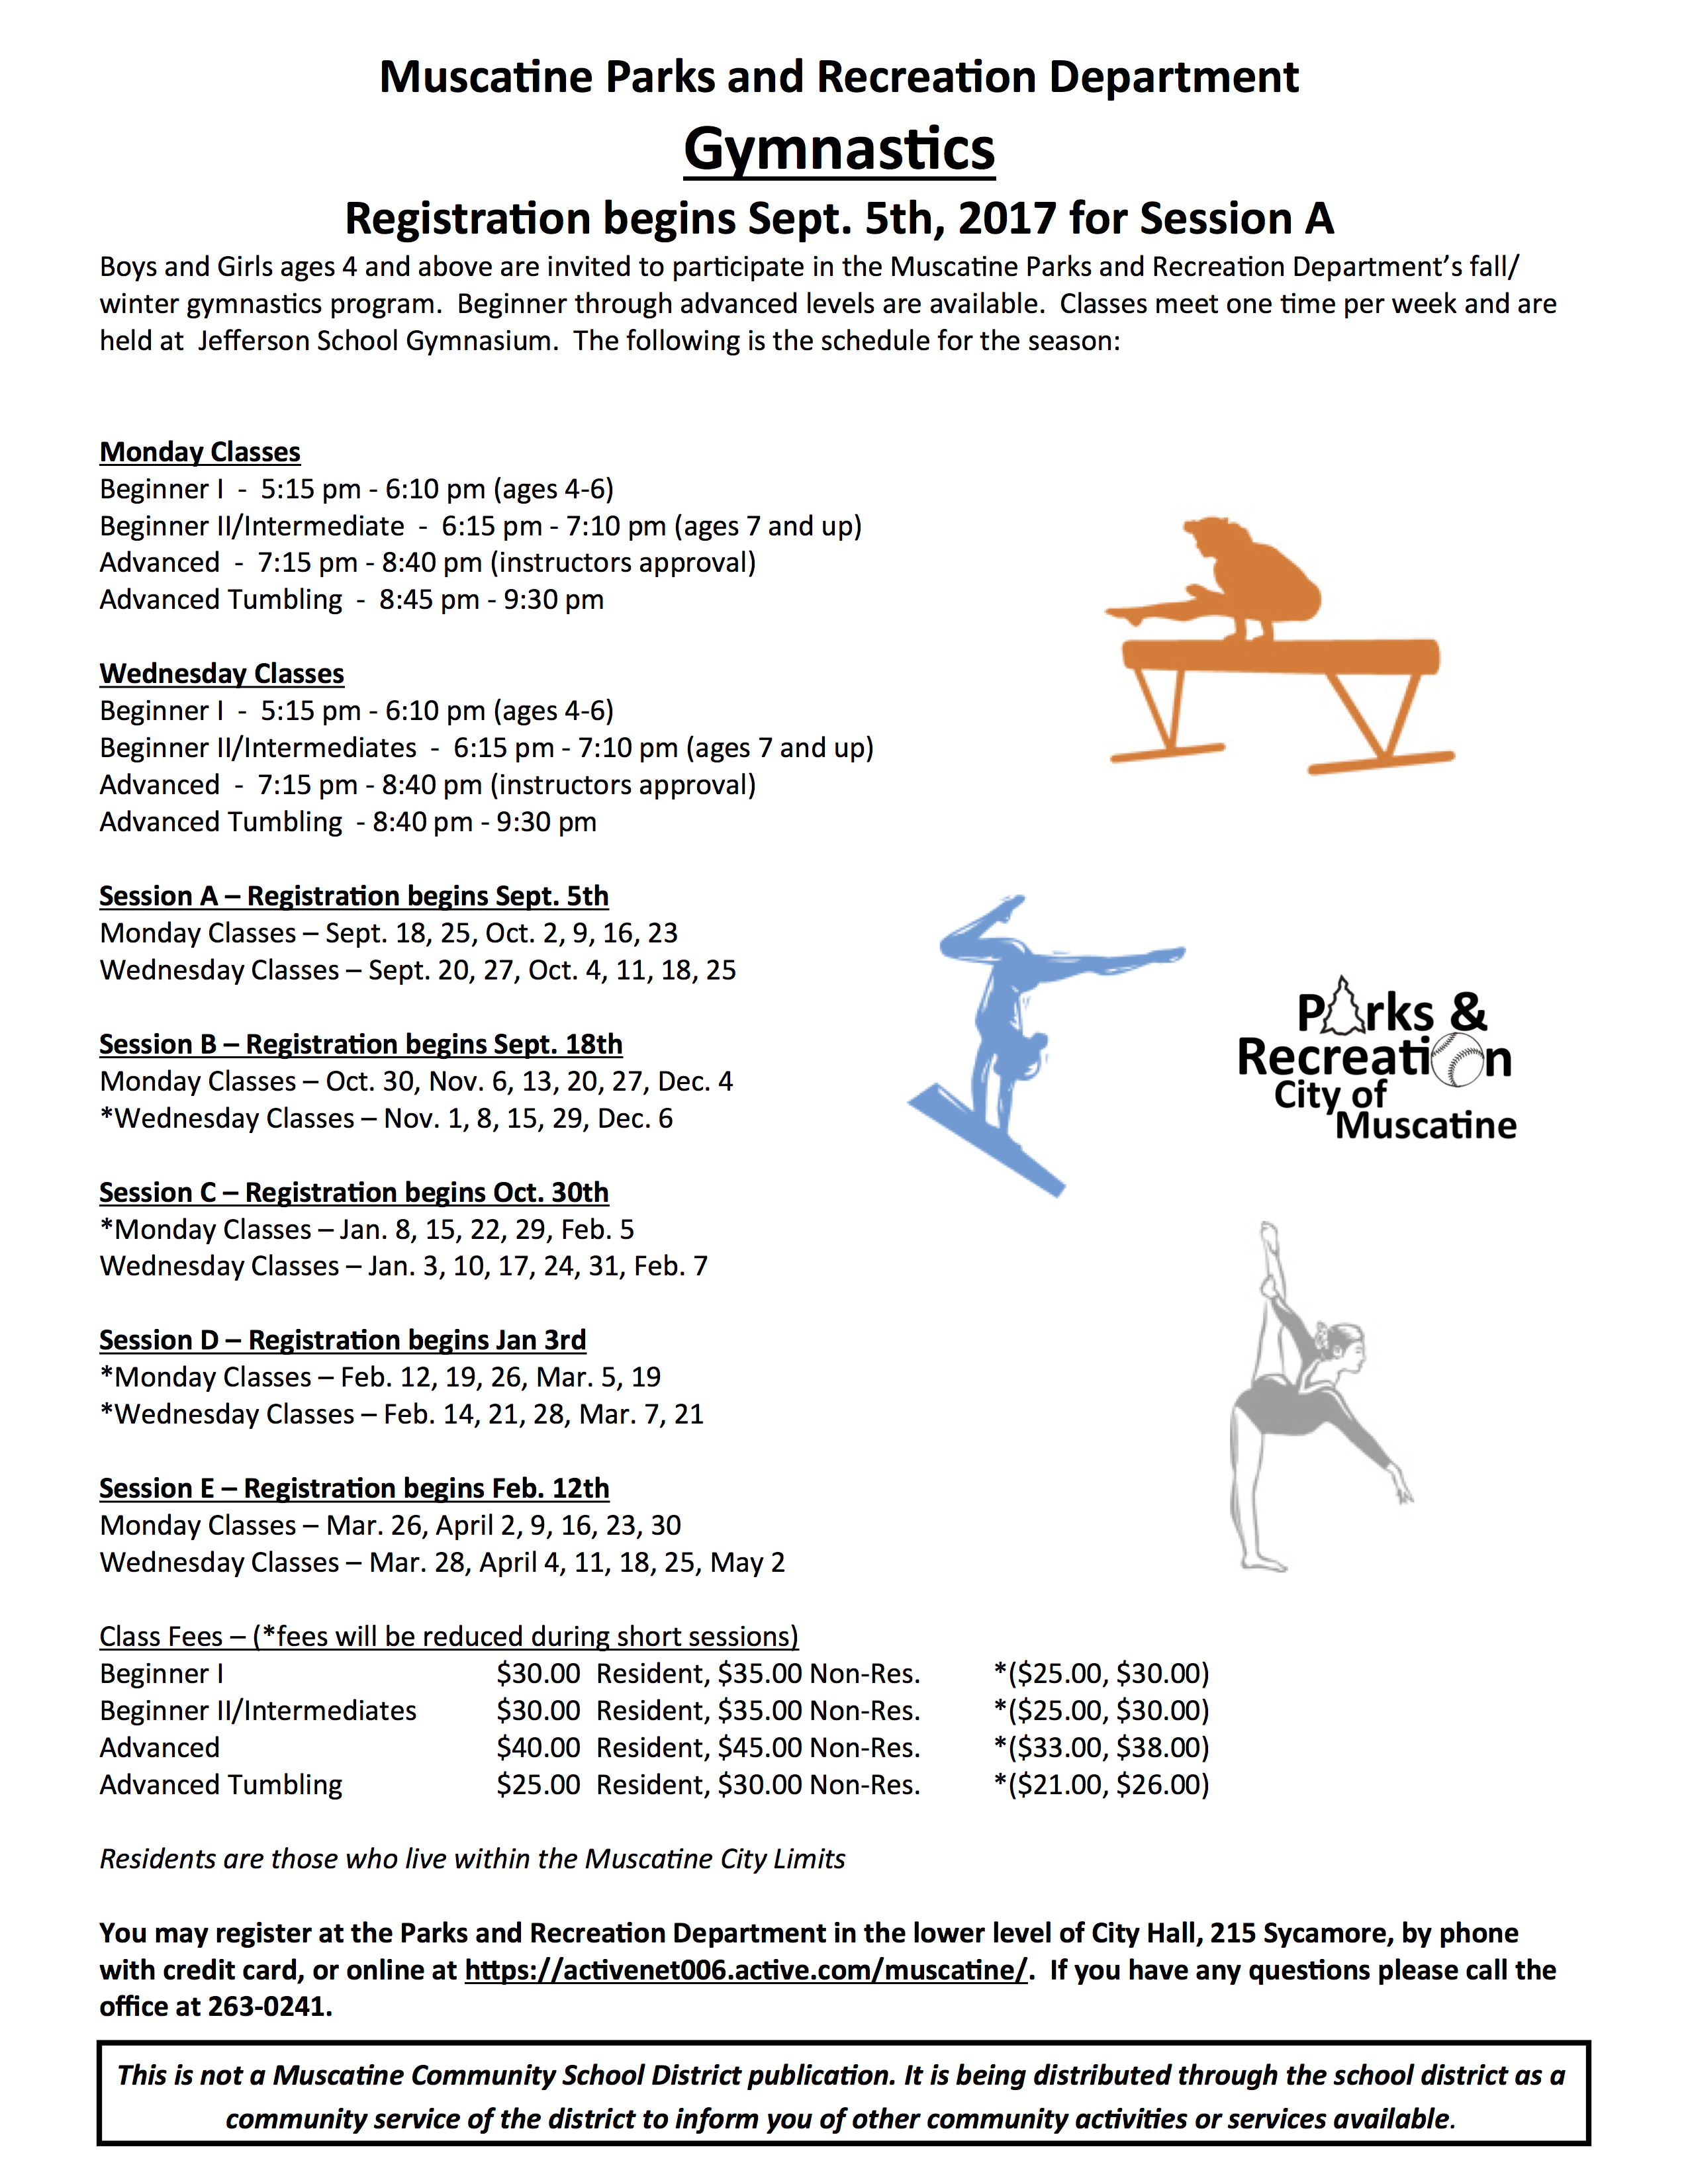 Musc Parks & Rec Gymnastics 2017-18 - Muscatine Community